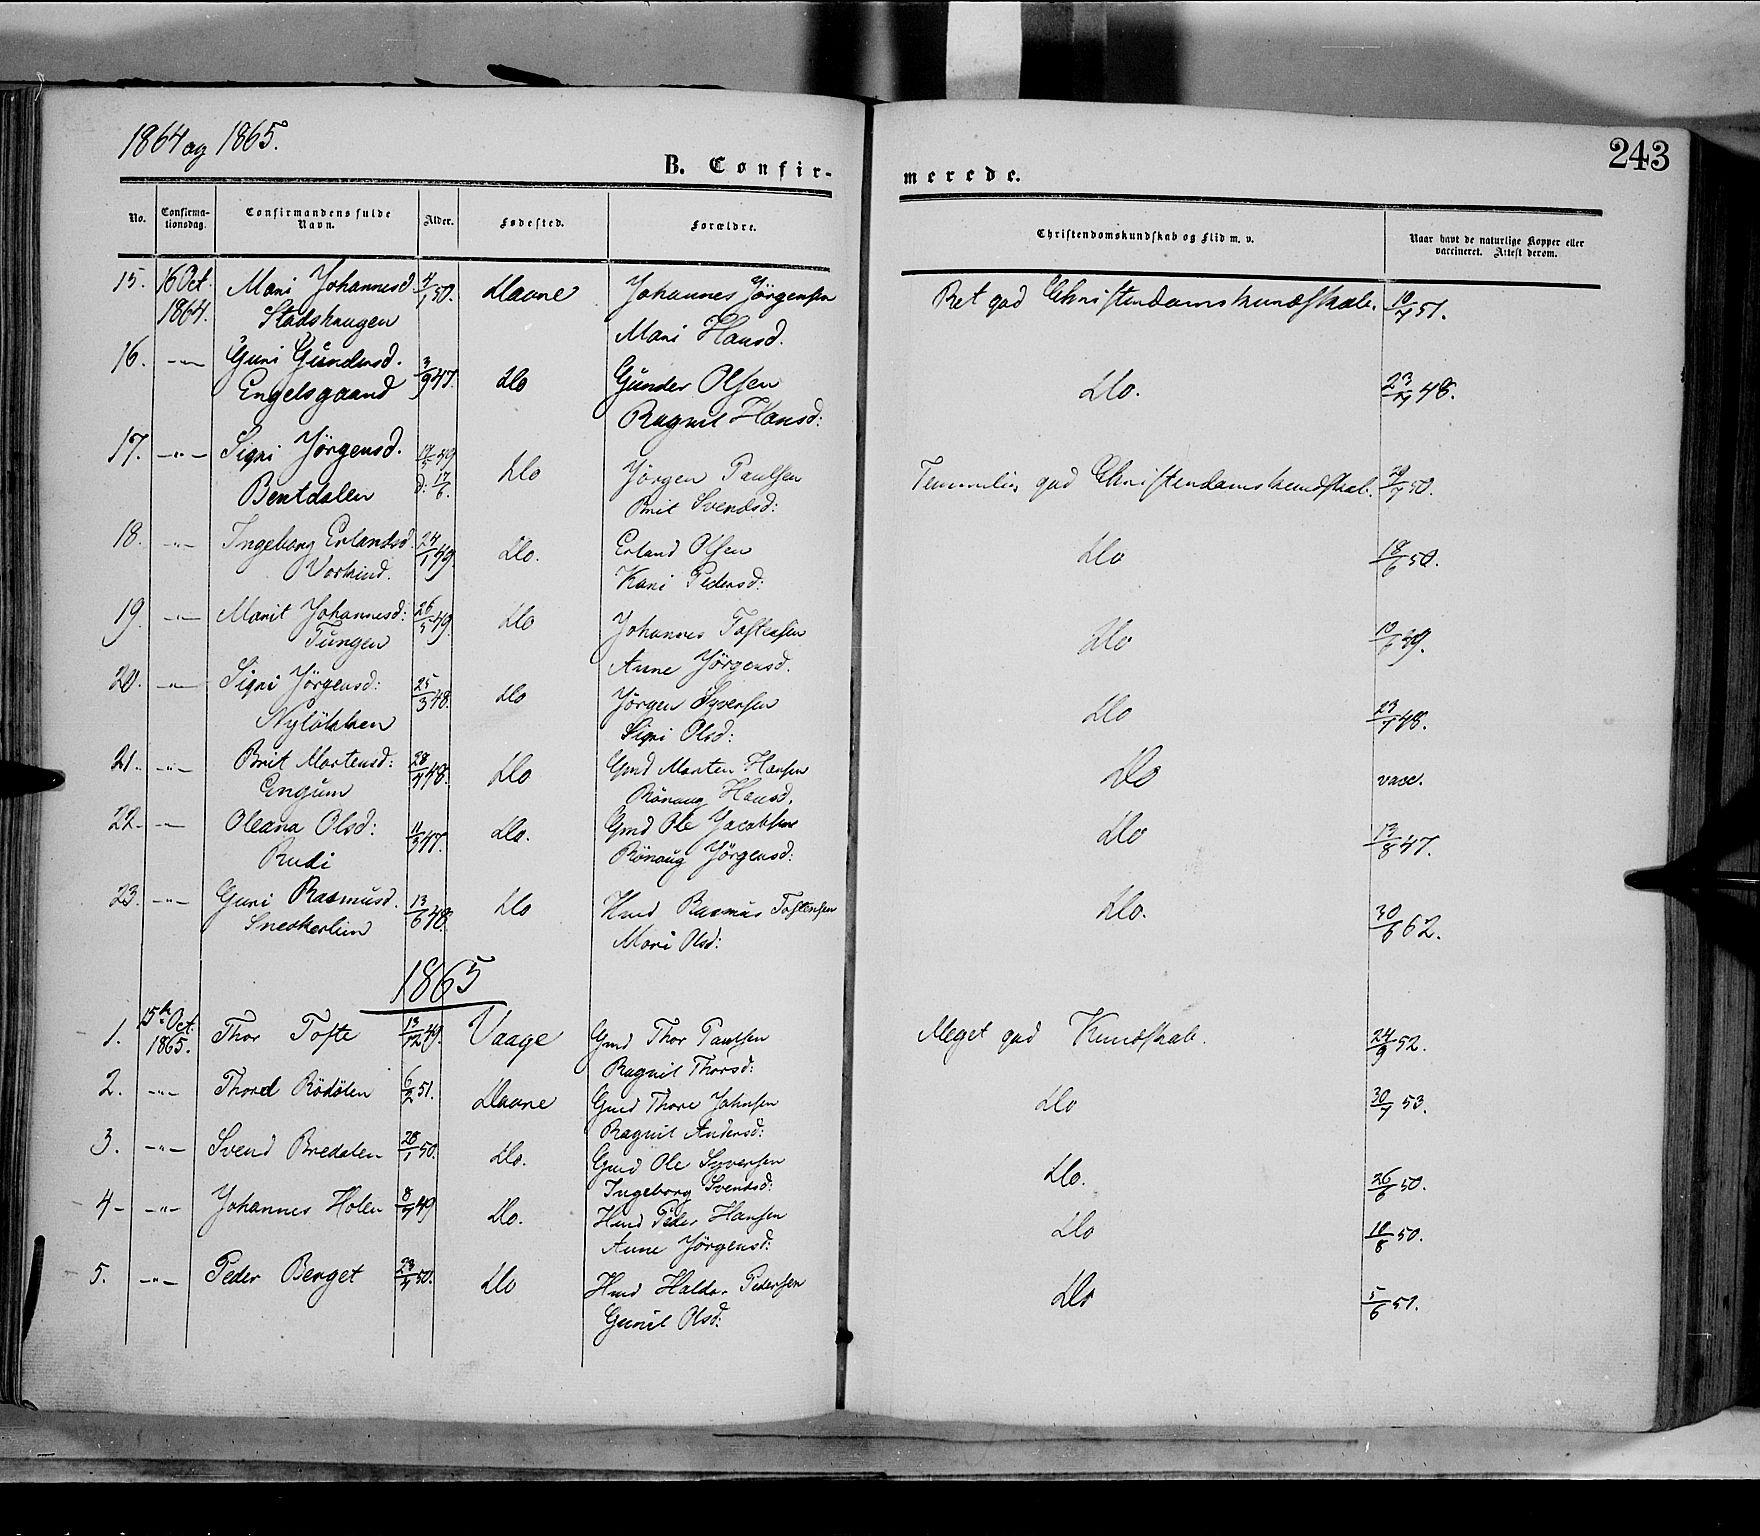 SAH, Dovre prestekontor, Parish register (official) no. 1, 1854-1878, p. 243